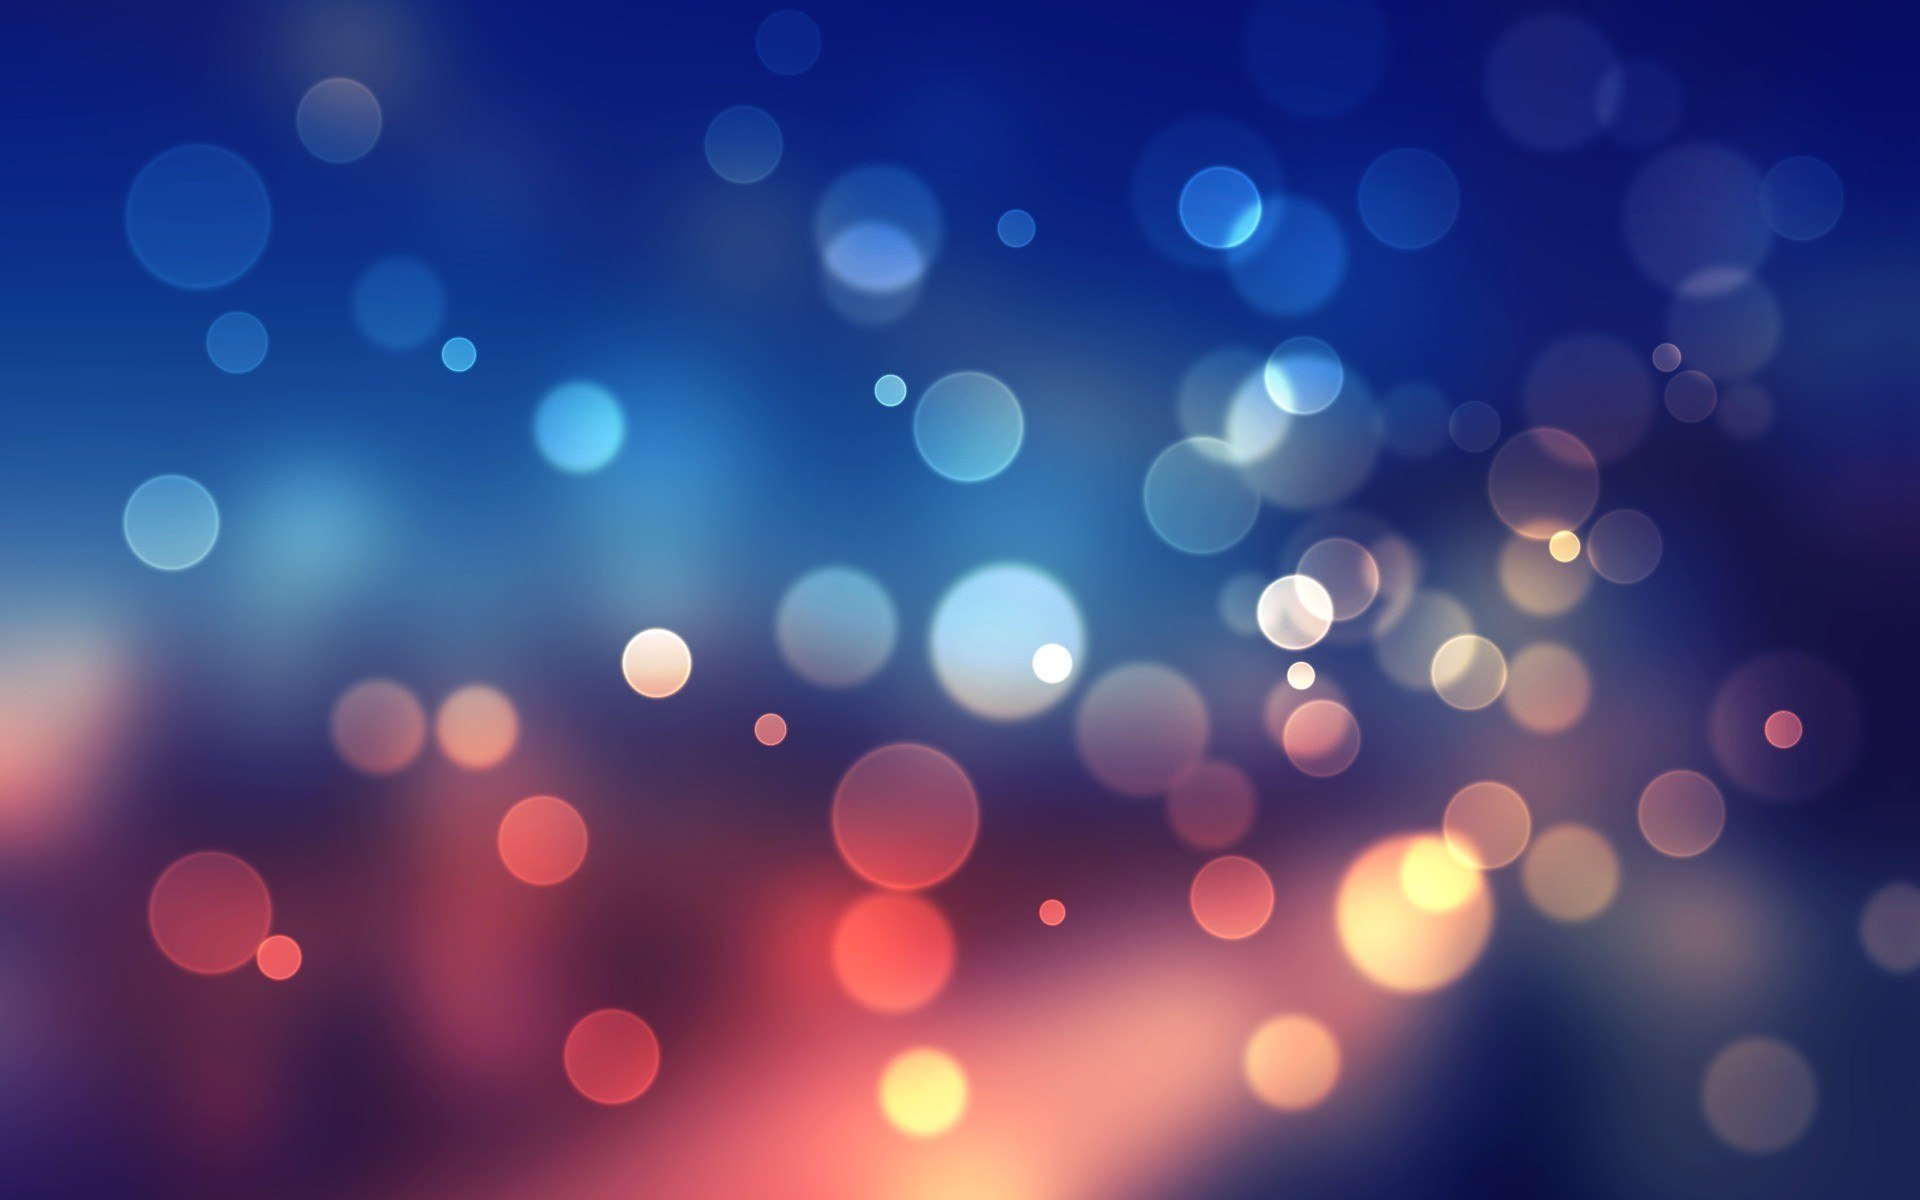 Bokeh lights wallpaper 1920x1200 HQ WALLPAPER - (#26841)